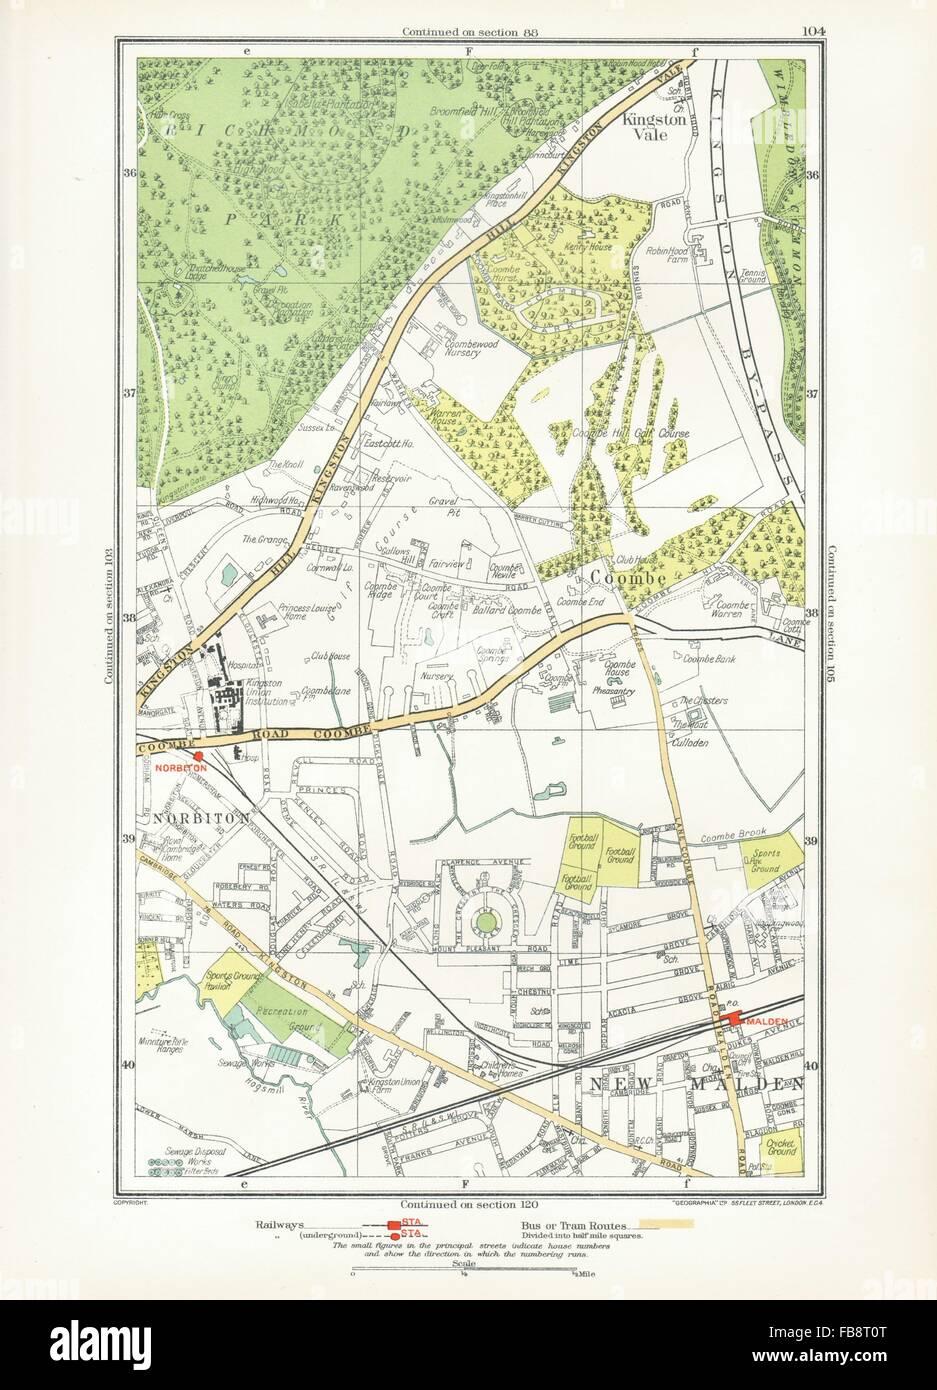 Norbiton Art Europe Maps Coombe Kingston Hill Kingston Vale New Malden Malden 1933 Old Map Sophisticated Technologies